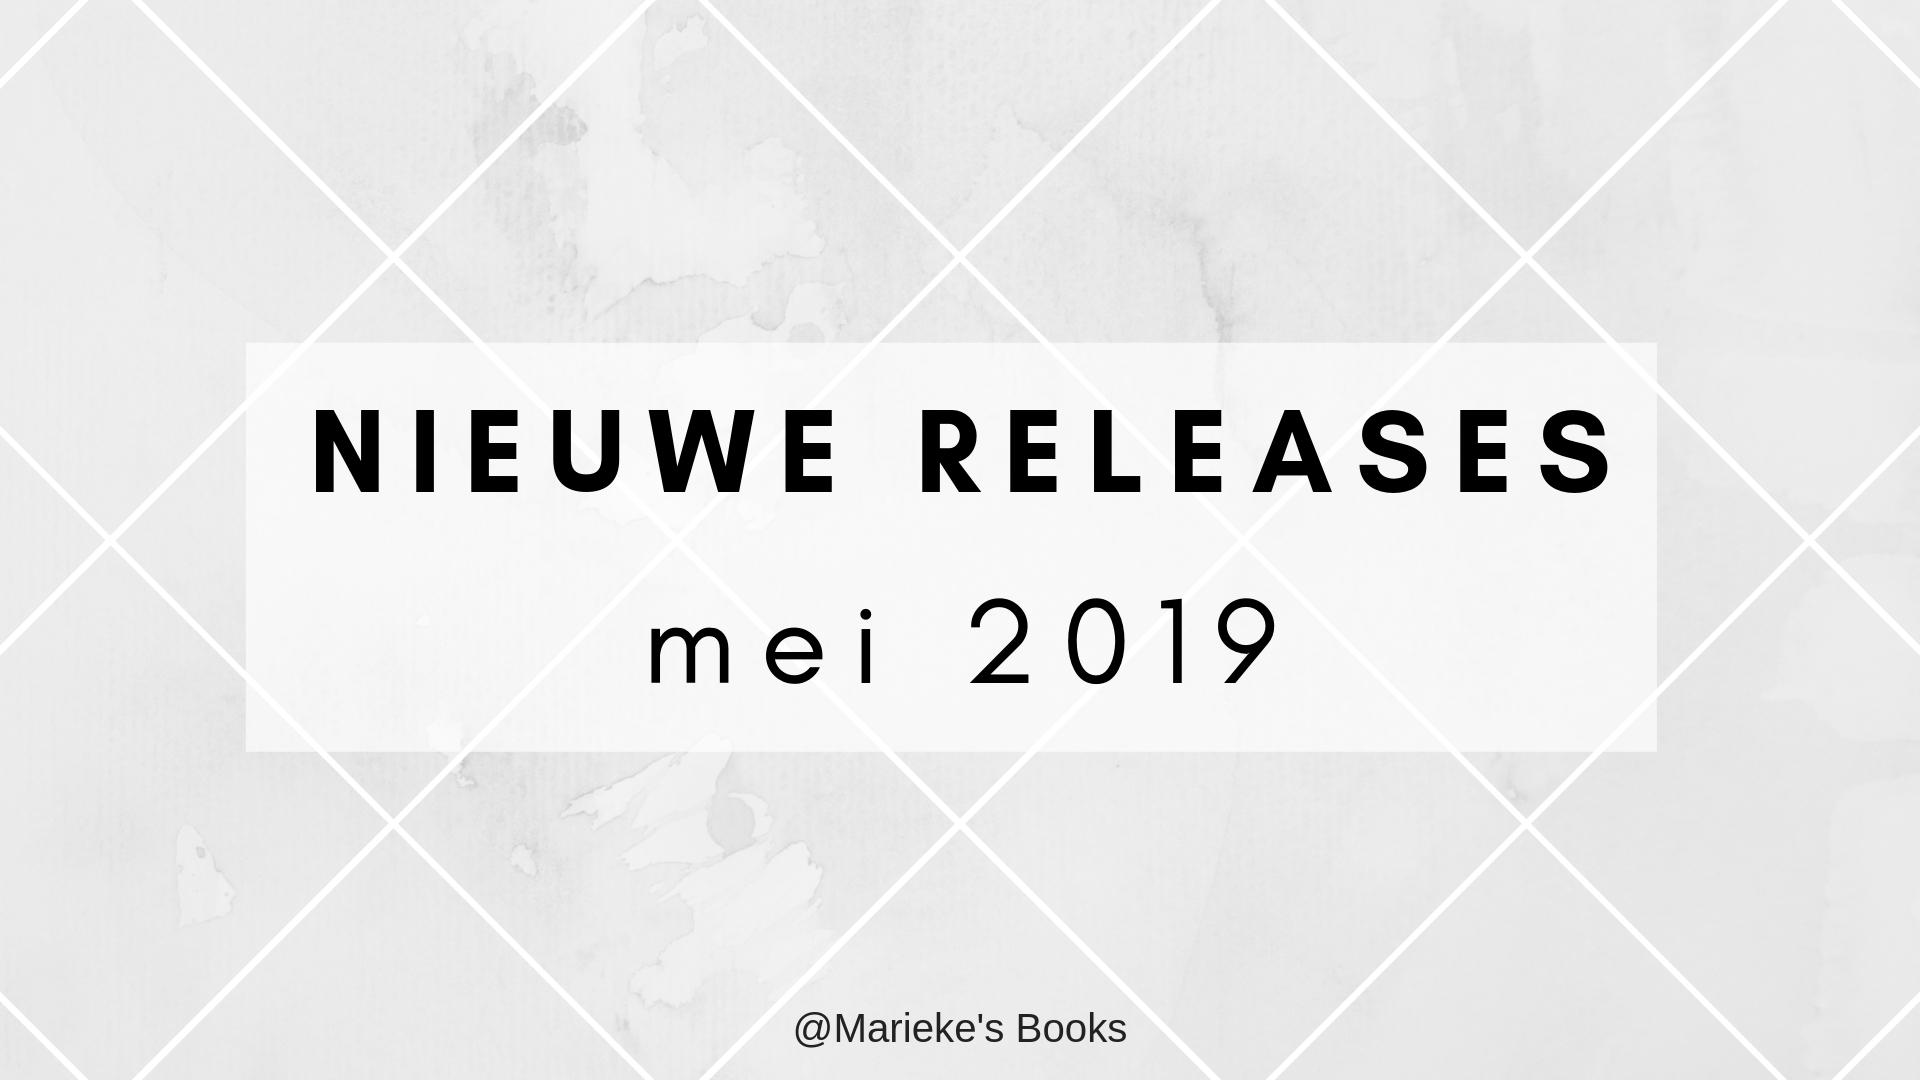 Nieuwe releases mei 2019 | Marieke's Books